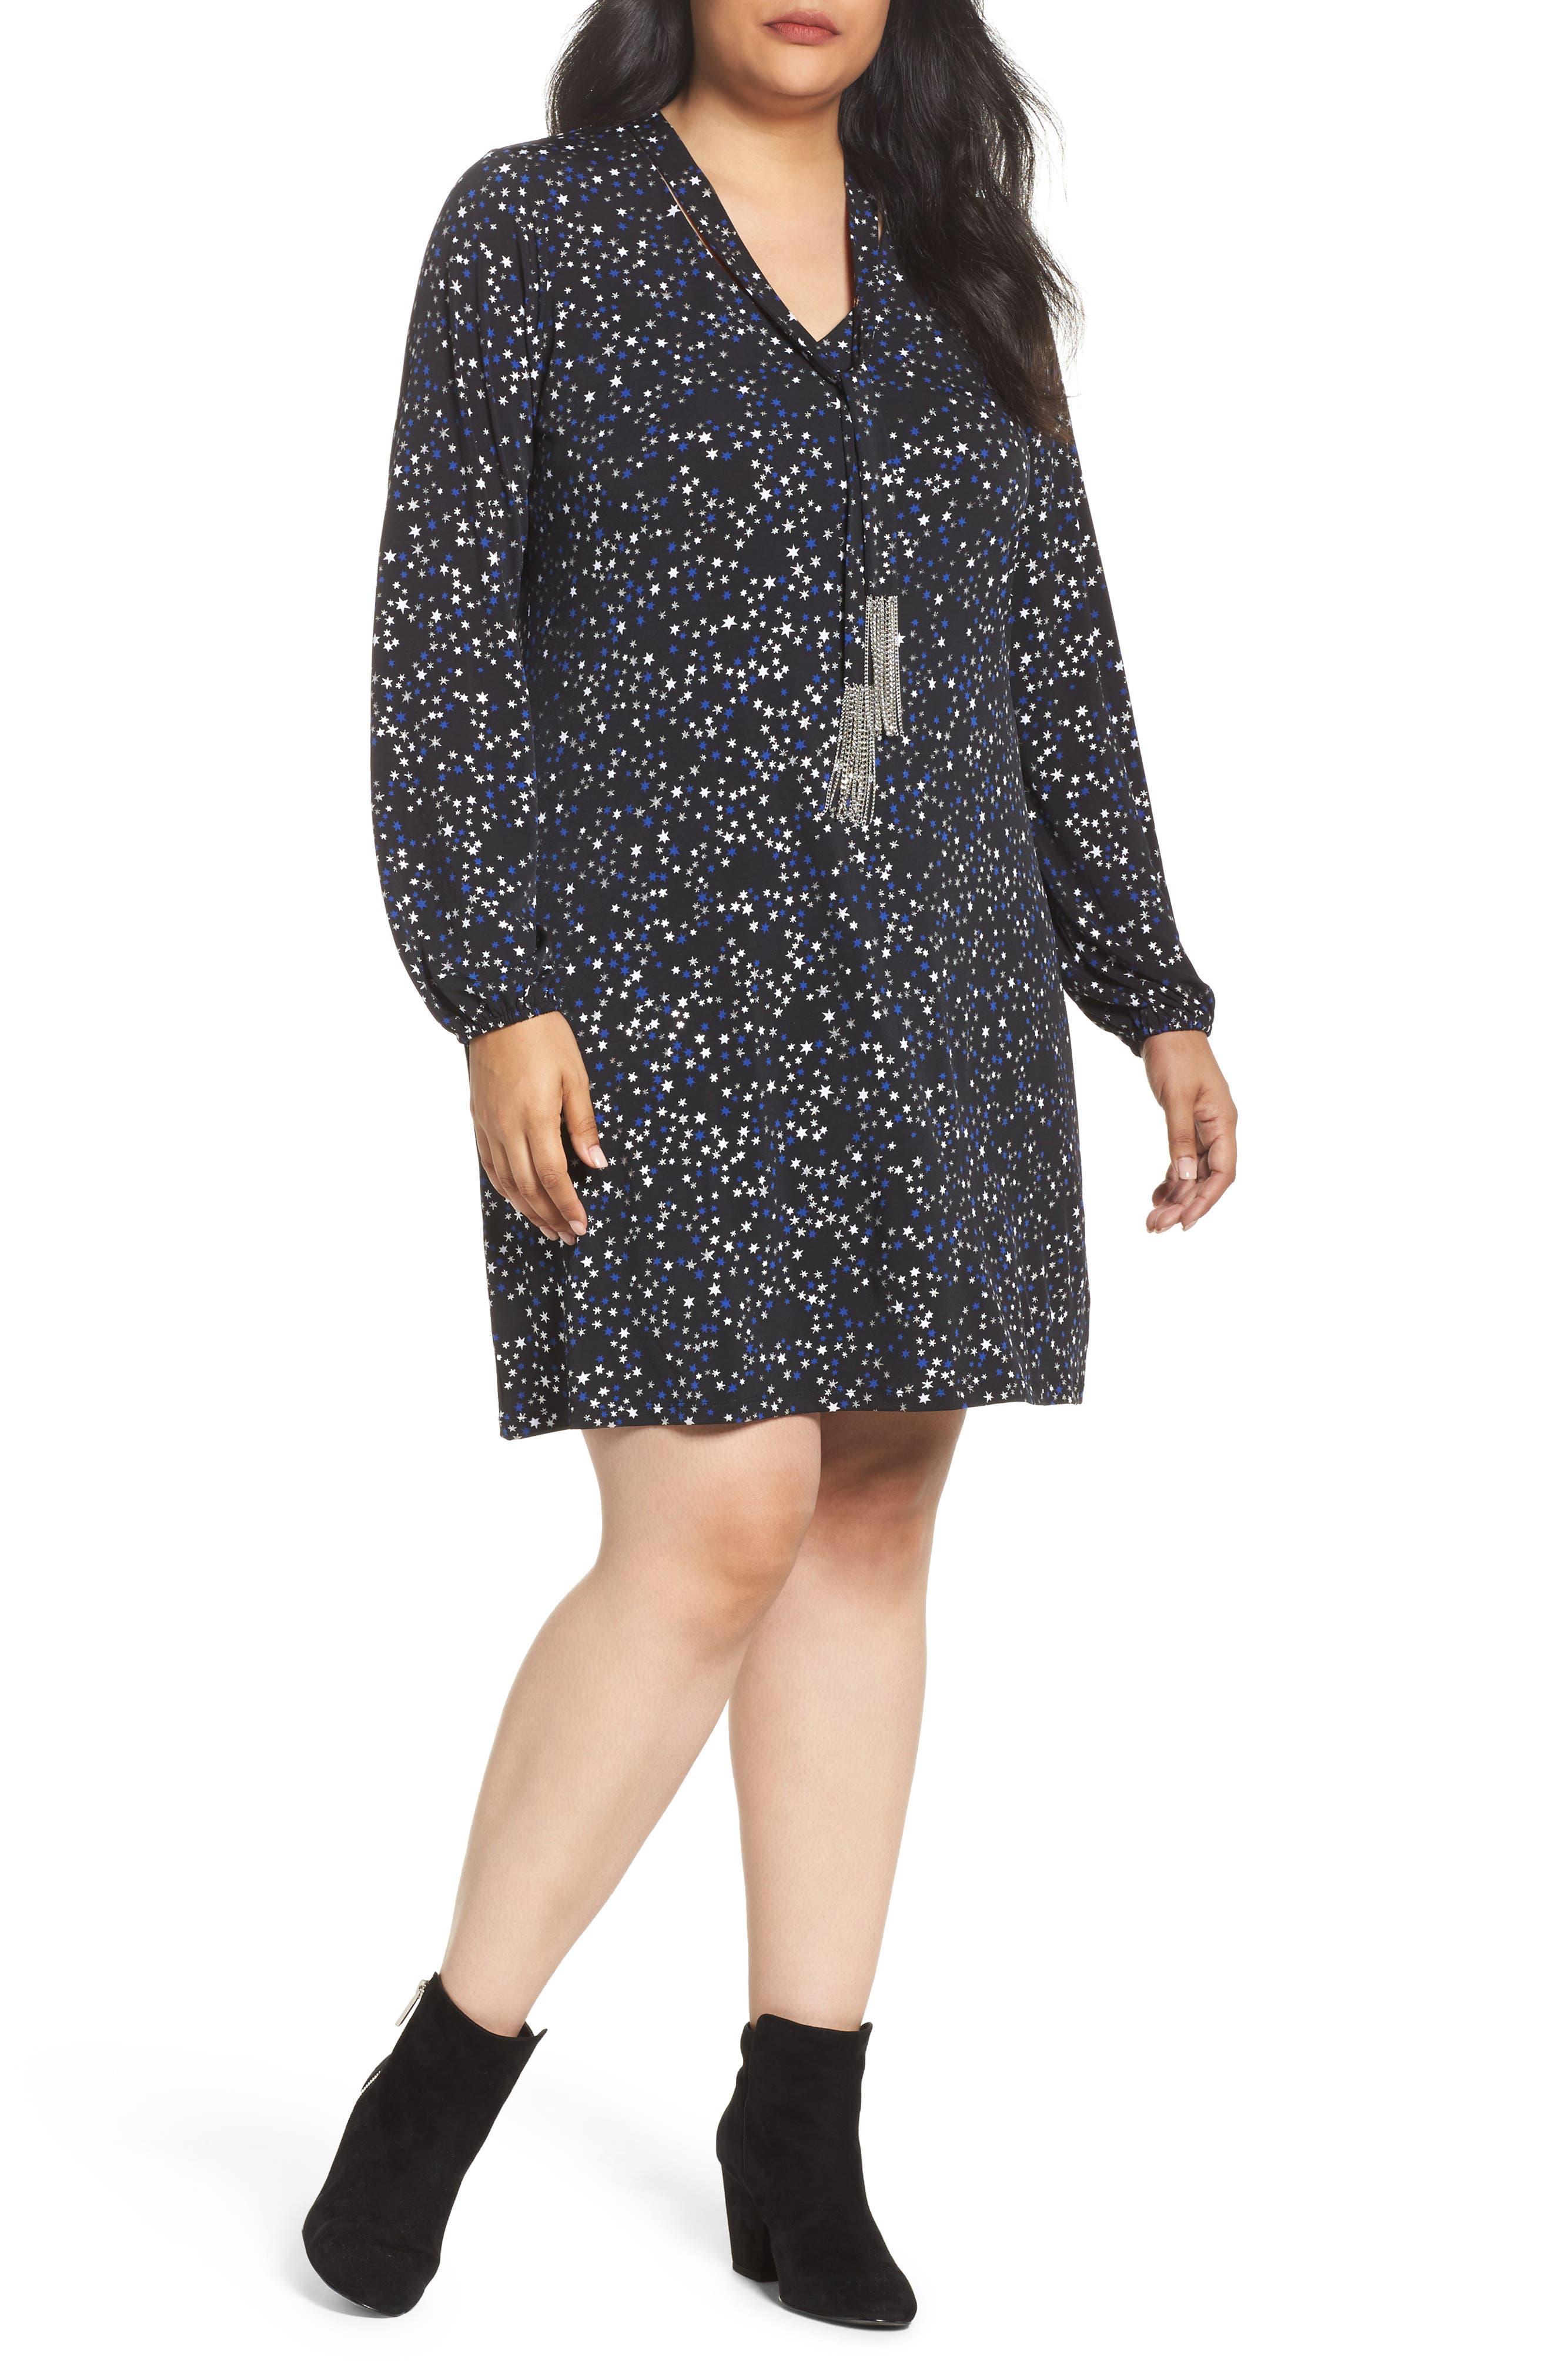 Alternate Image 1 Selected - MICHAEL Michael Kors Foil Star A-Line Dress (Plus Size)